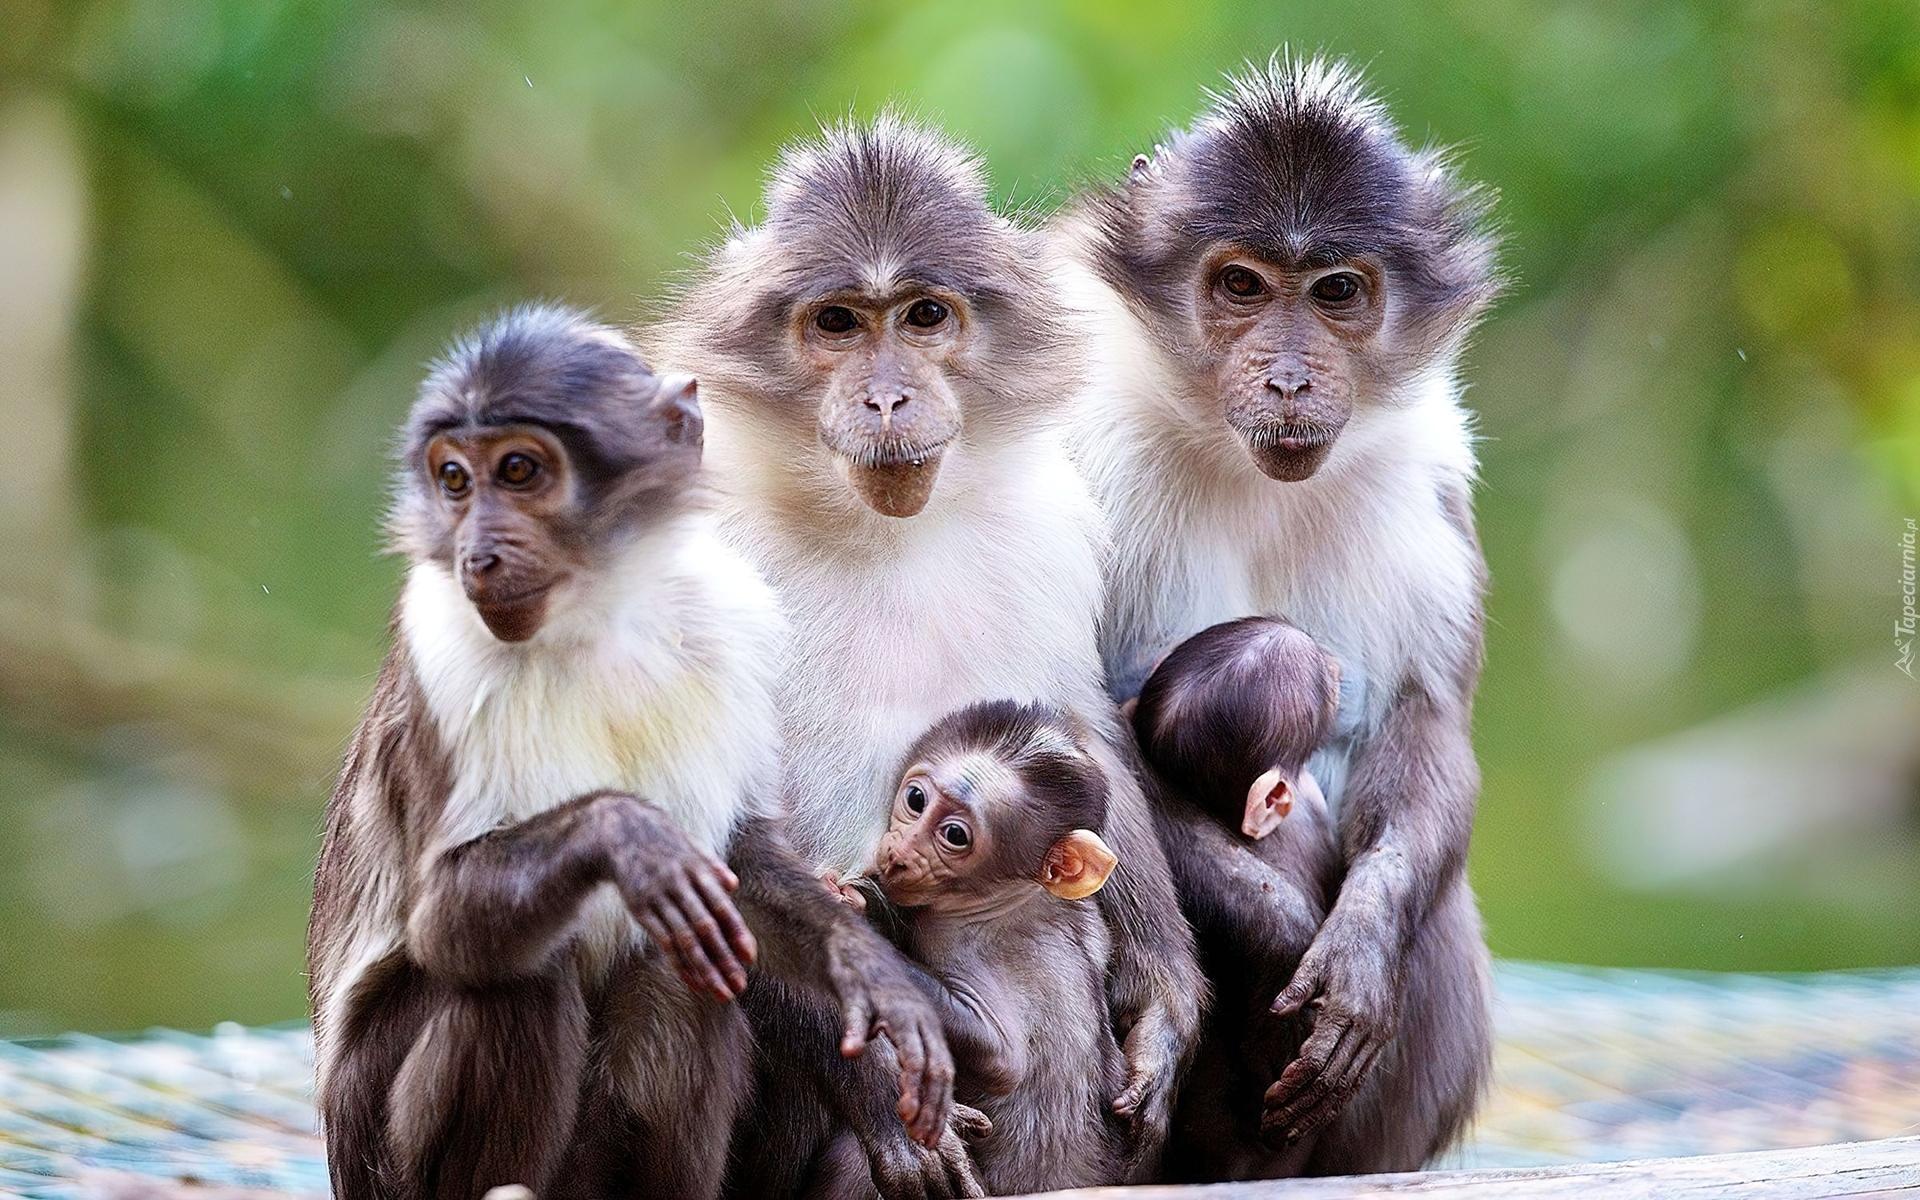 Cute Monkey Wallpapers For Mobile Małpki Małpy